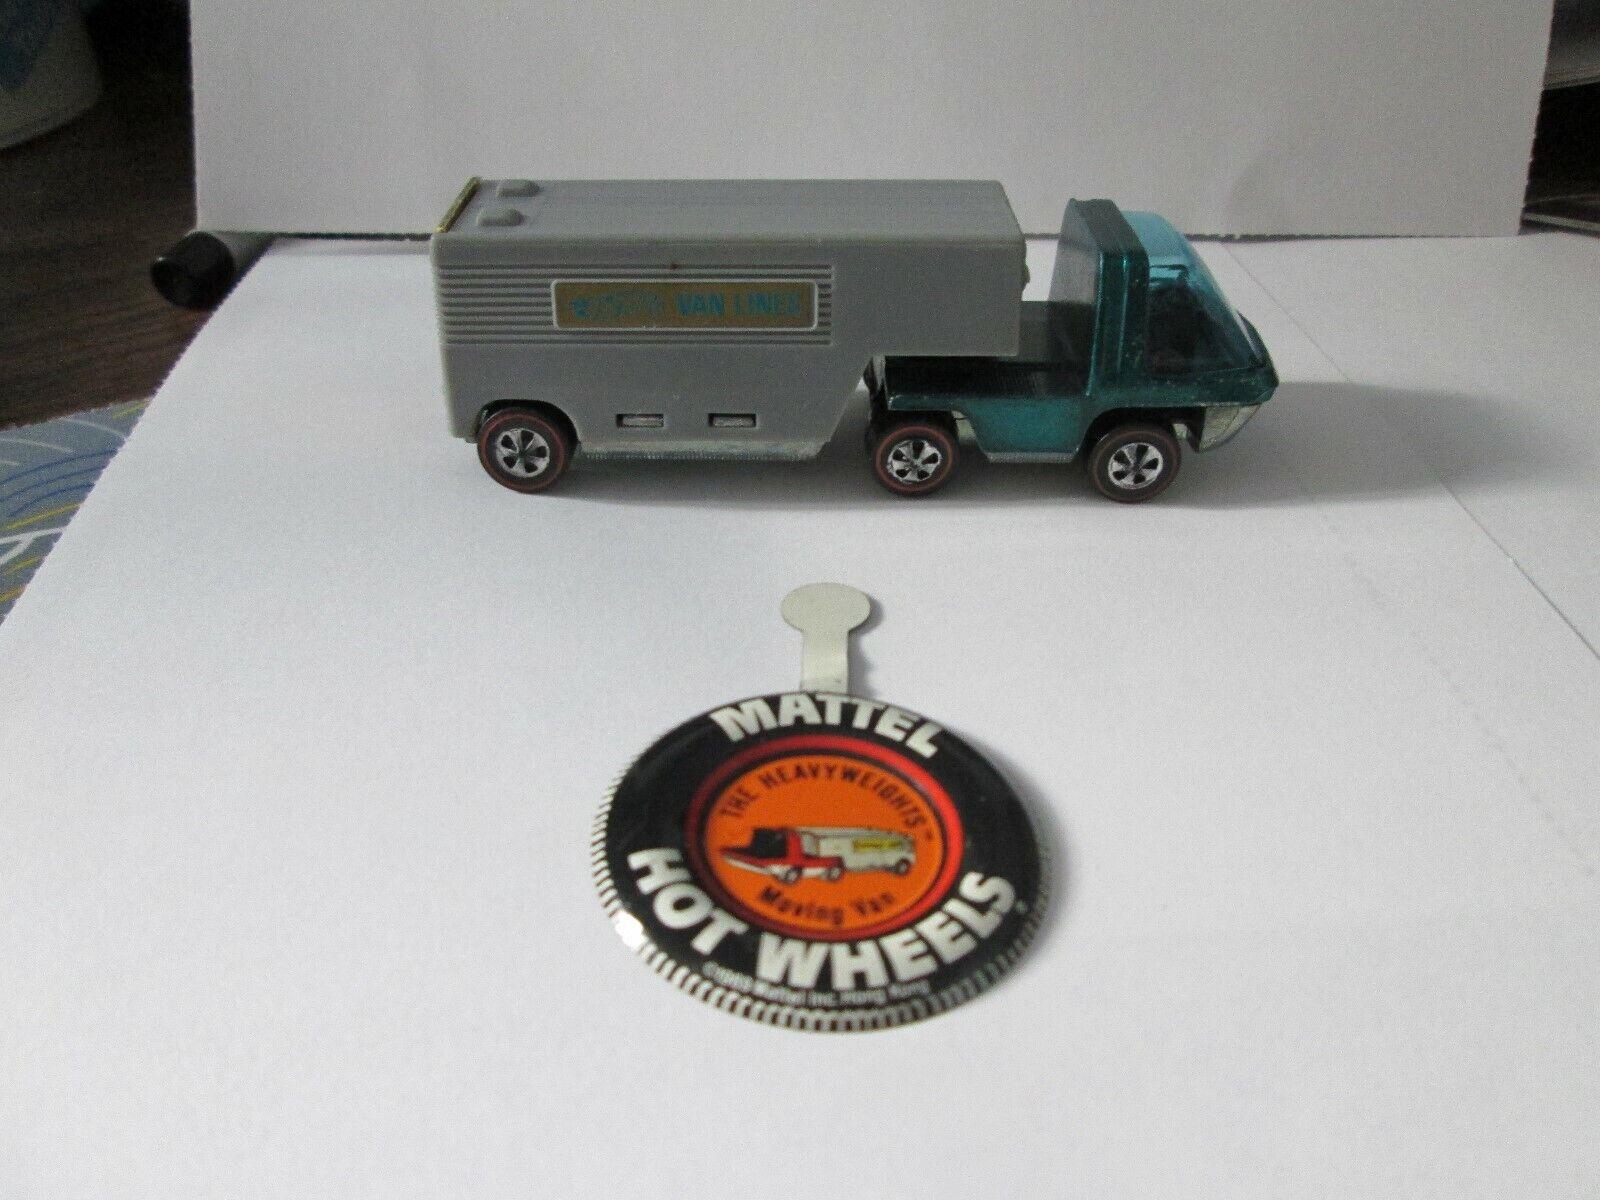 Hot Wheels Redline Early run w smooth back door - Heavyweights Van Lines w Badge